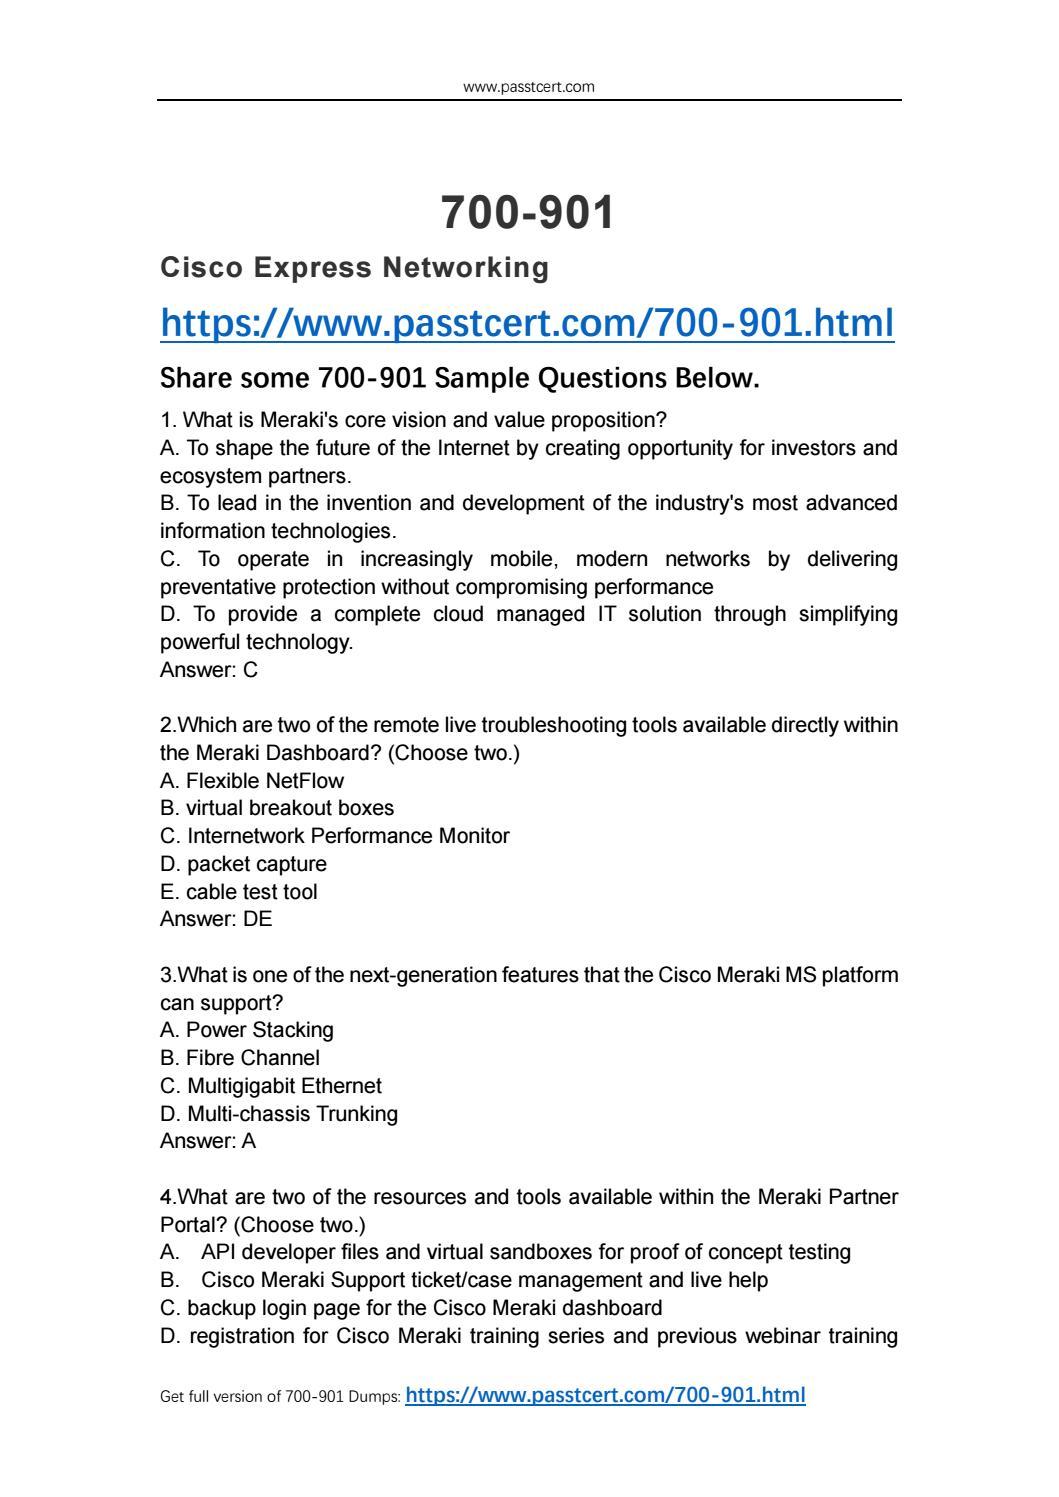 2018 Passtcert Cisco 700-901 Exam Dumps by nigel - issuu